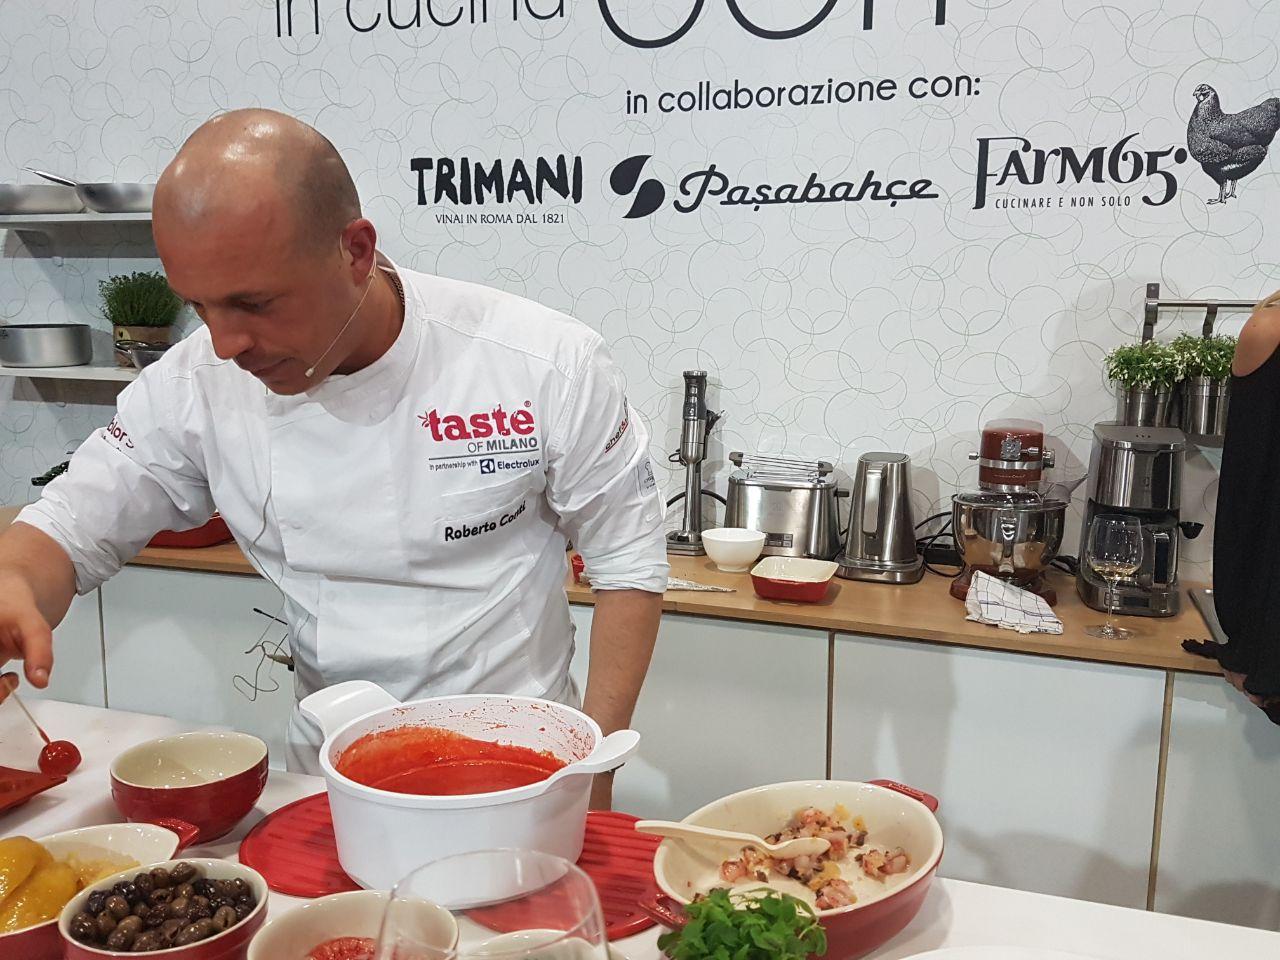 Img 20170509 wa0056 for Taste of milano 2017